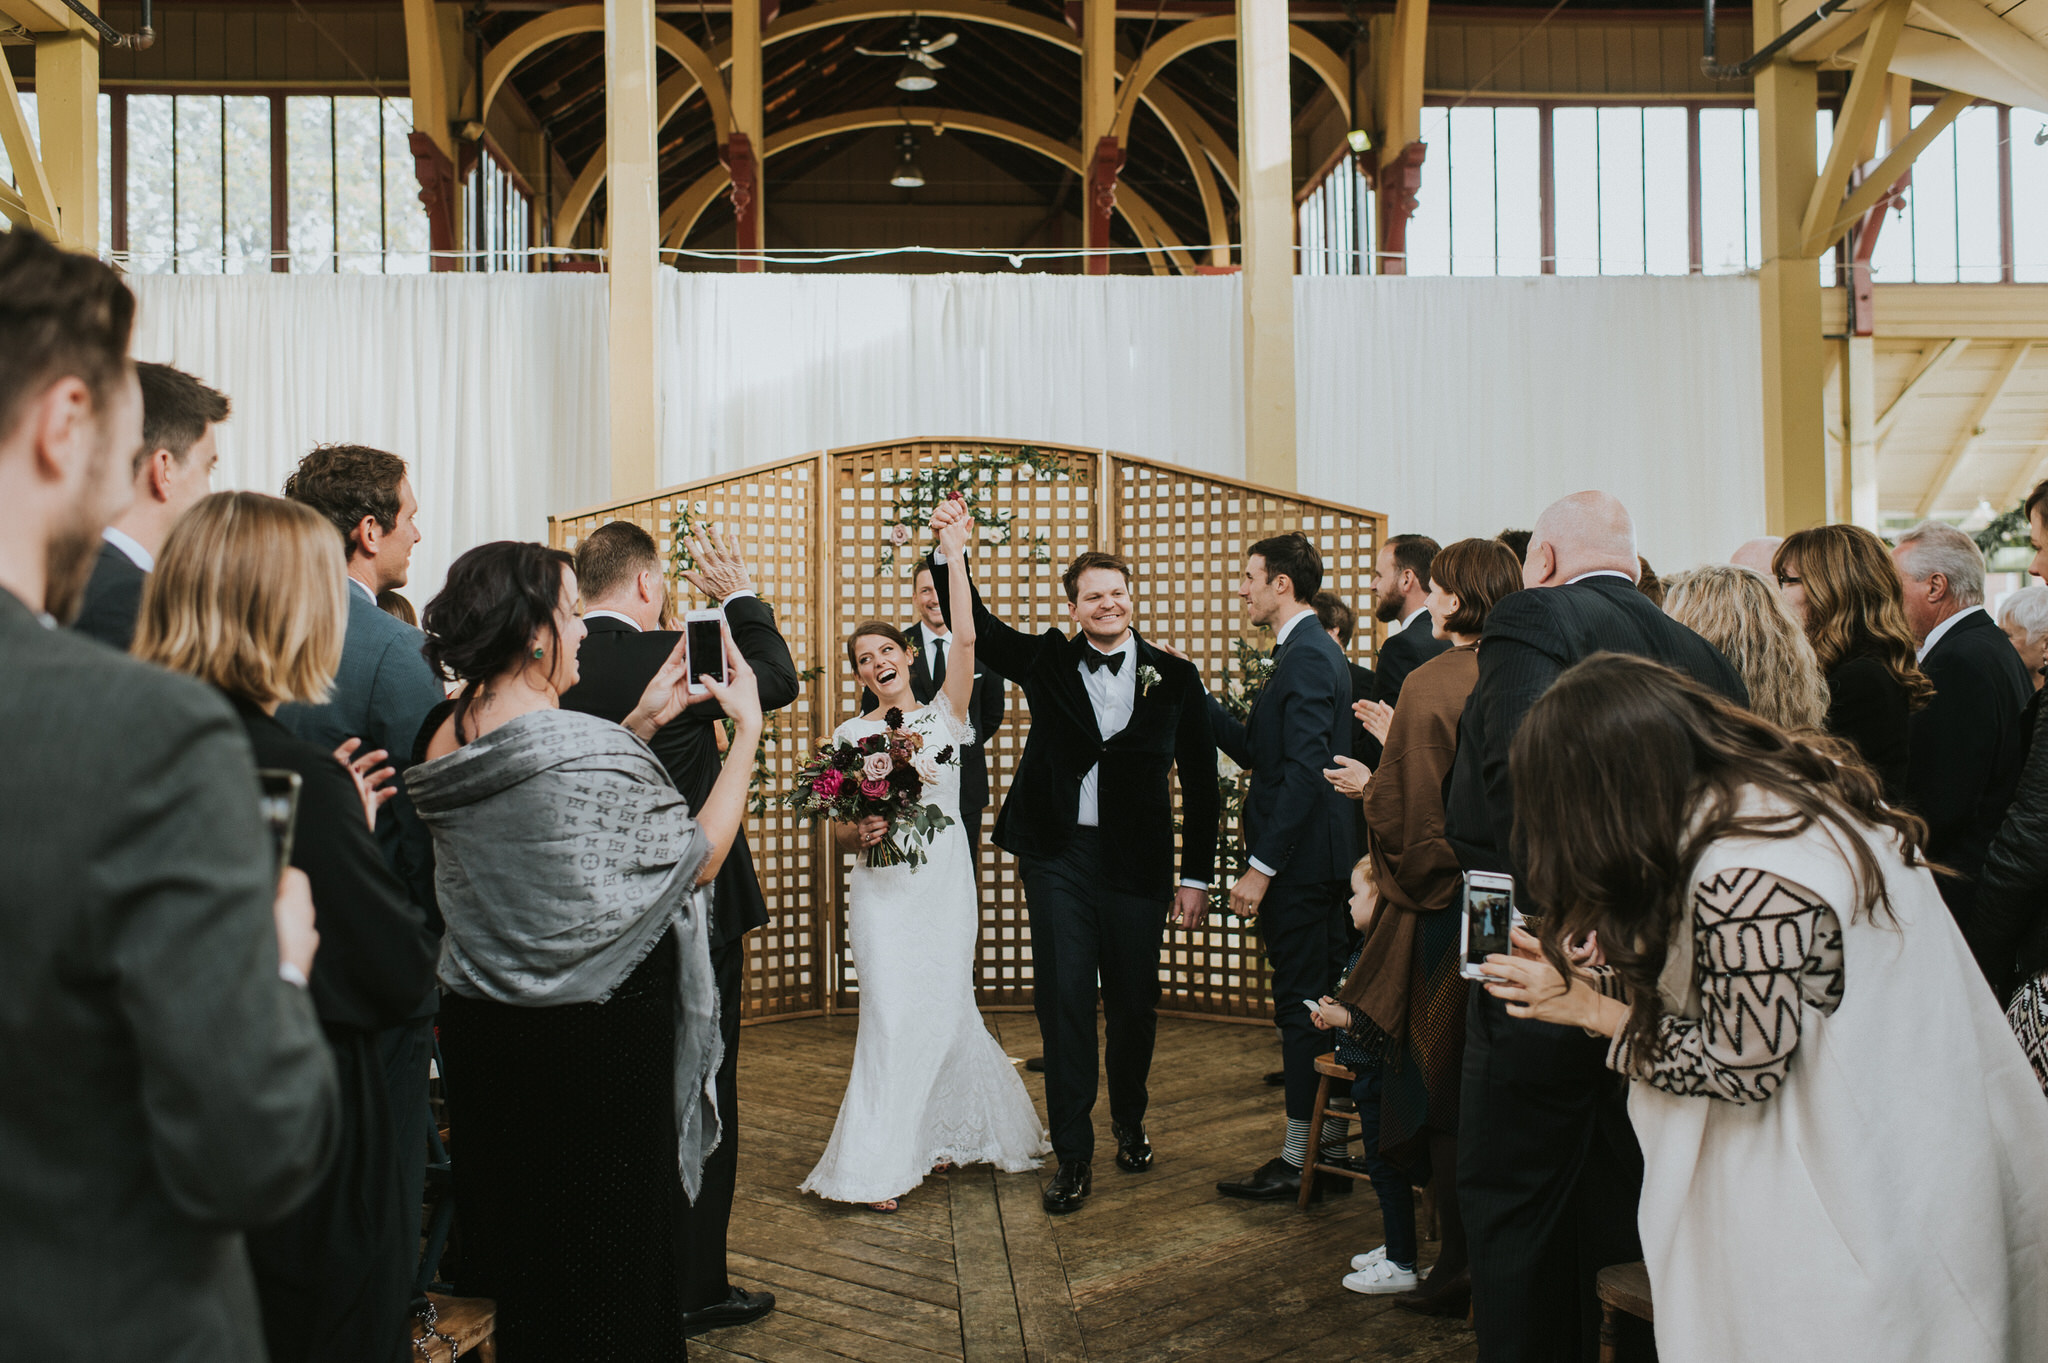 scarletoneillphotography_weddingphotography_prince edward county weddings122.JPG